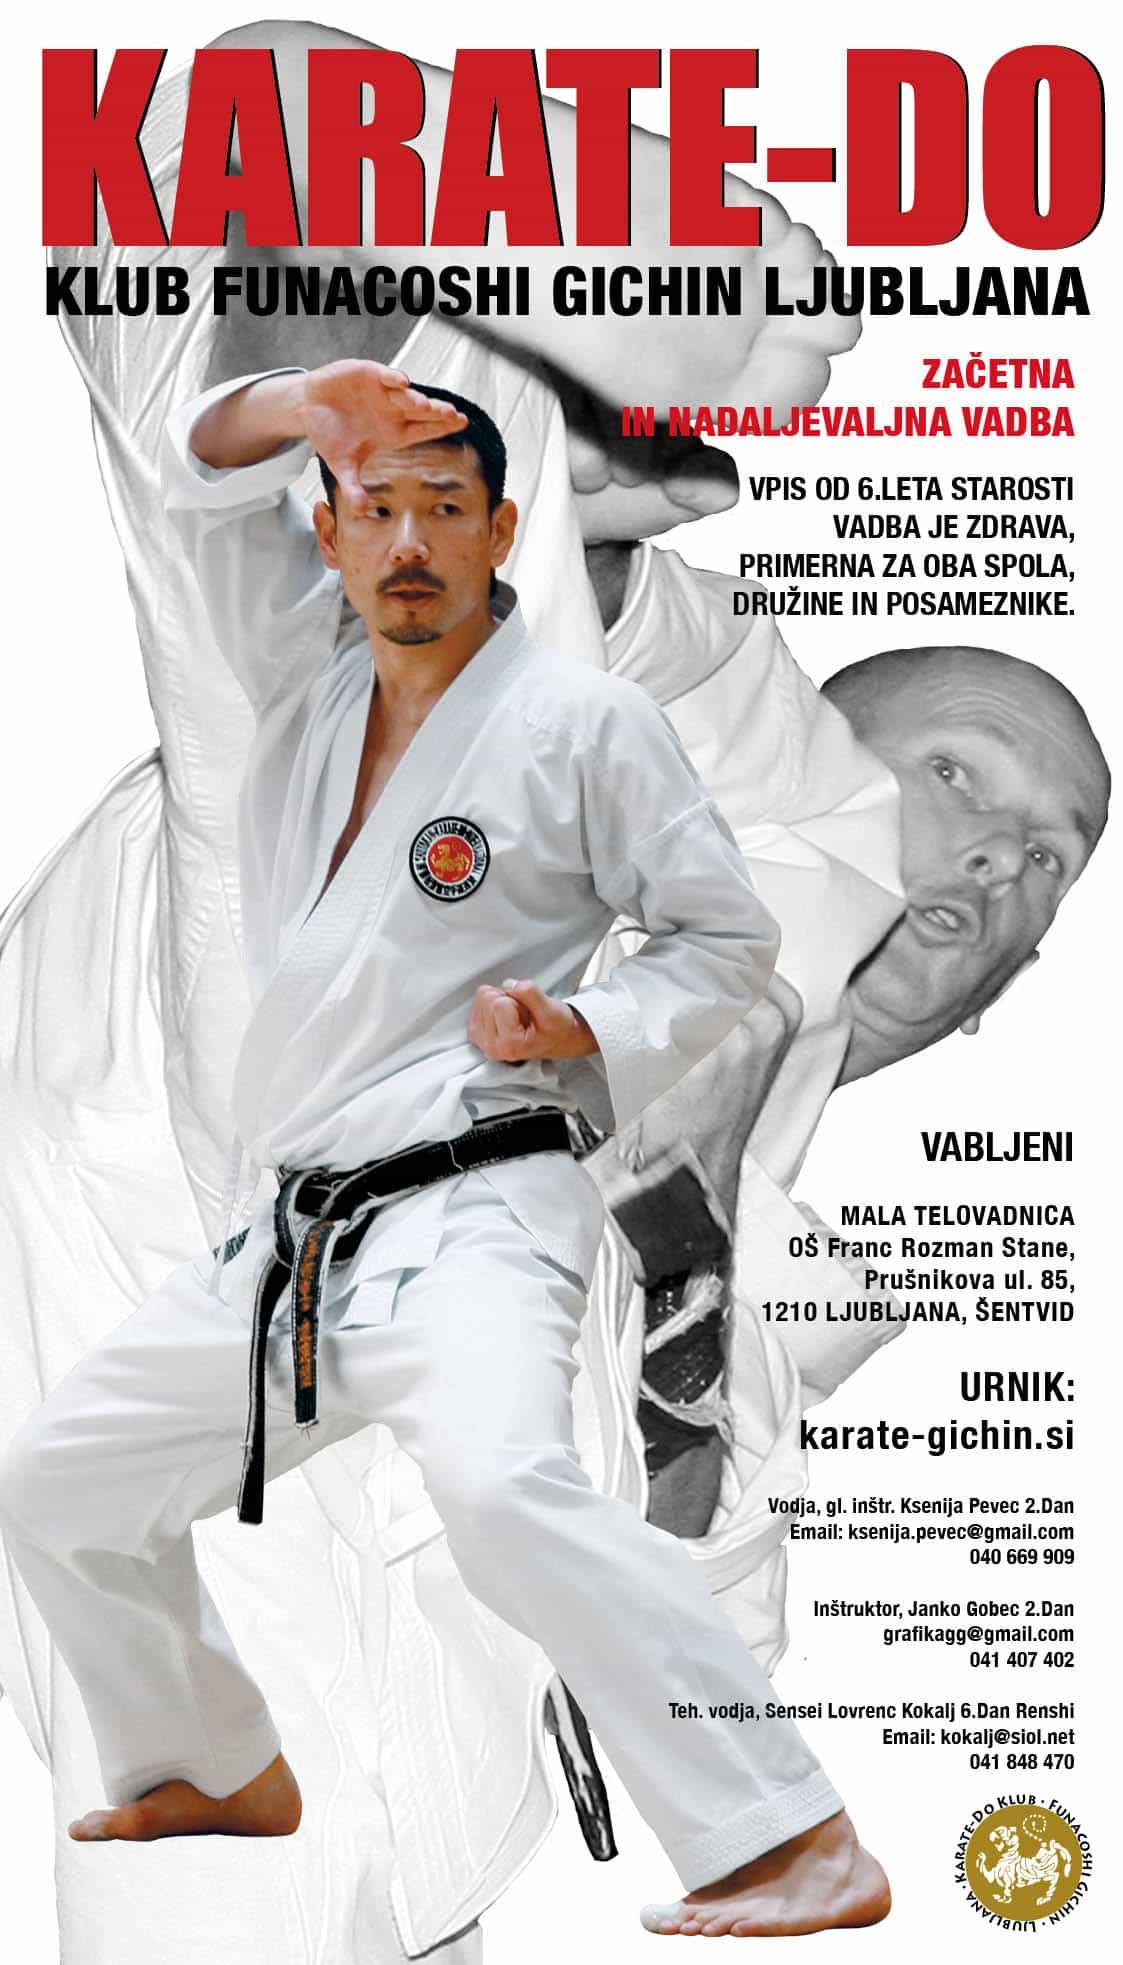 Funacoshi Gichin Ljubljana, plakat za vpis, leto 2017